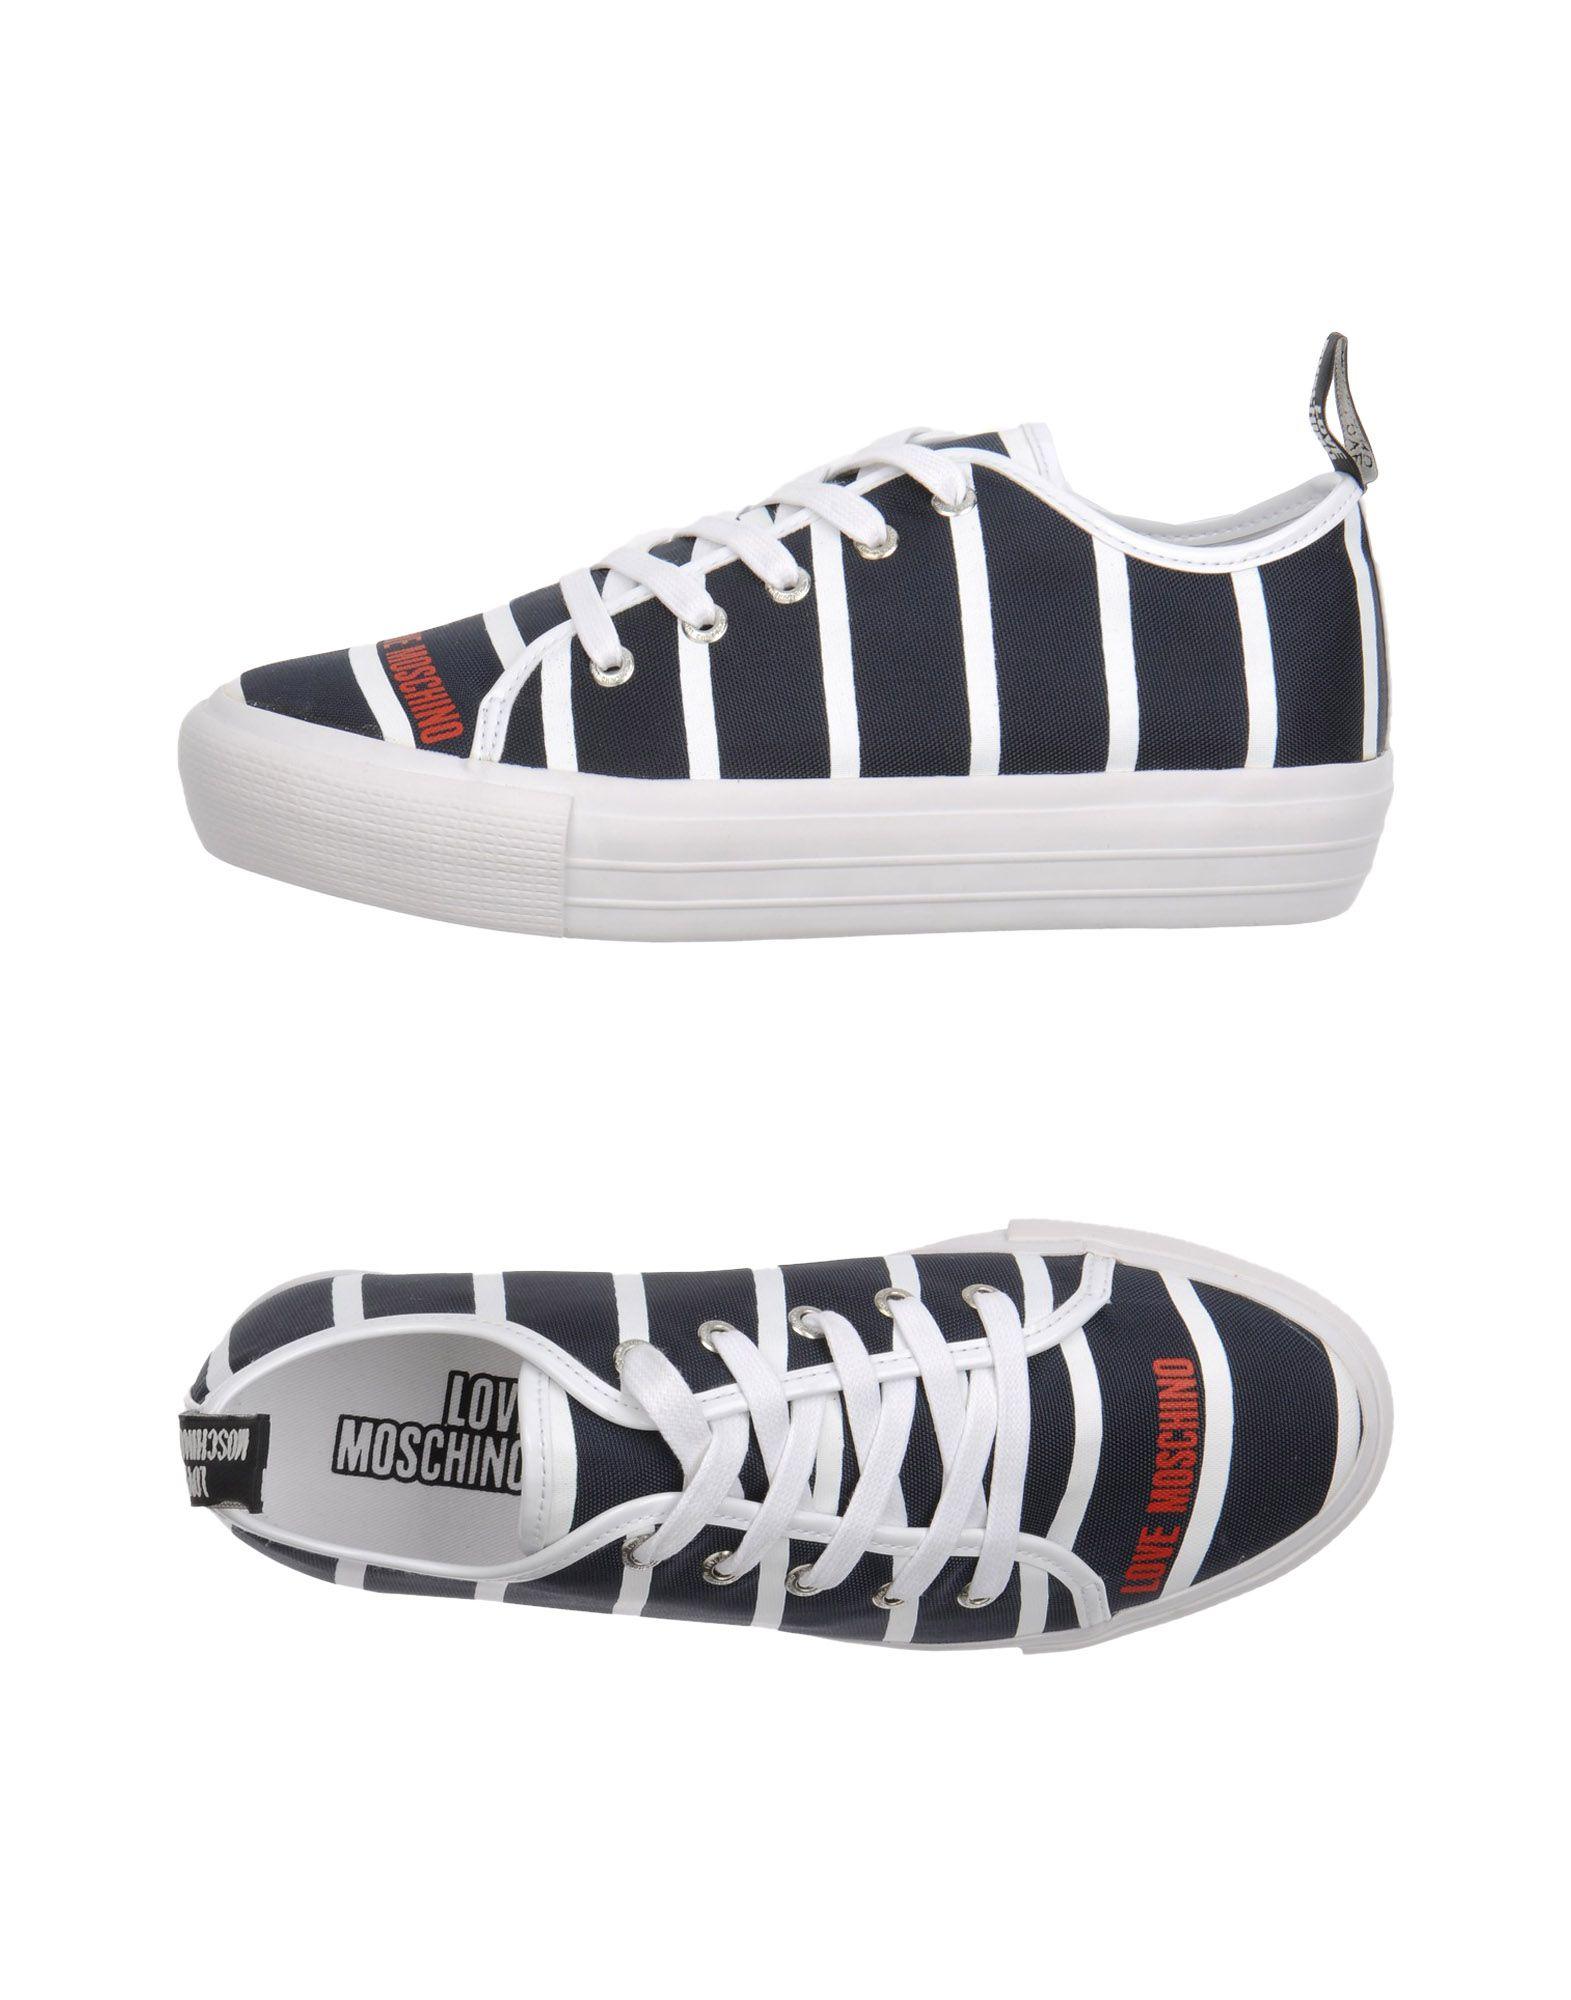 Love Moschino Sneakers Damen  11205790KH Gute Qualität beliebte Schuhe